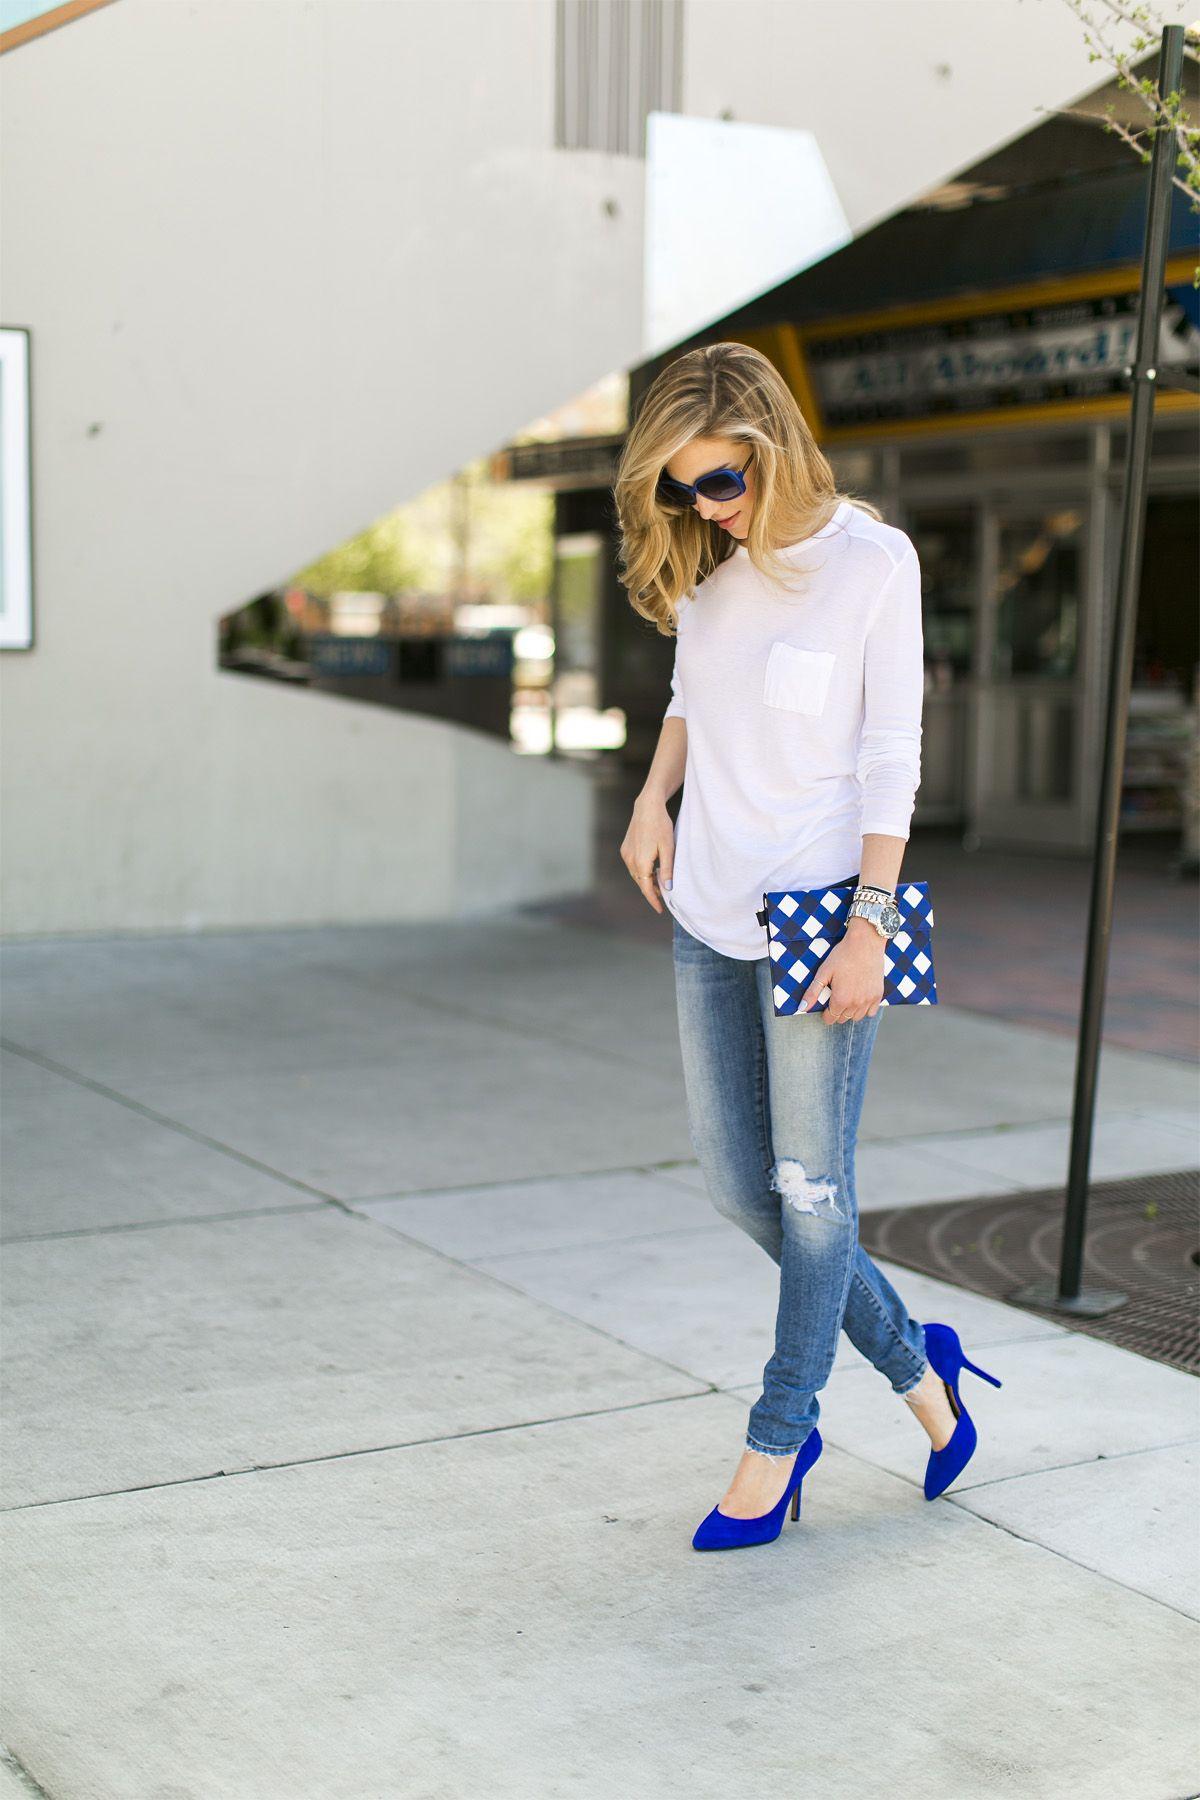 Feeling Blue Ropa Zapatos Azules Jeans Y Tacones